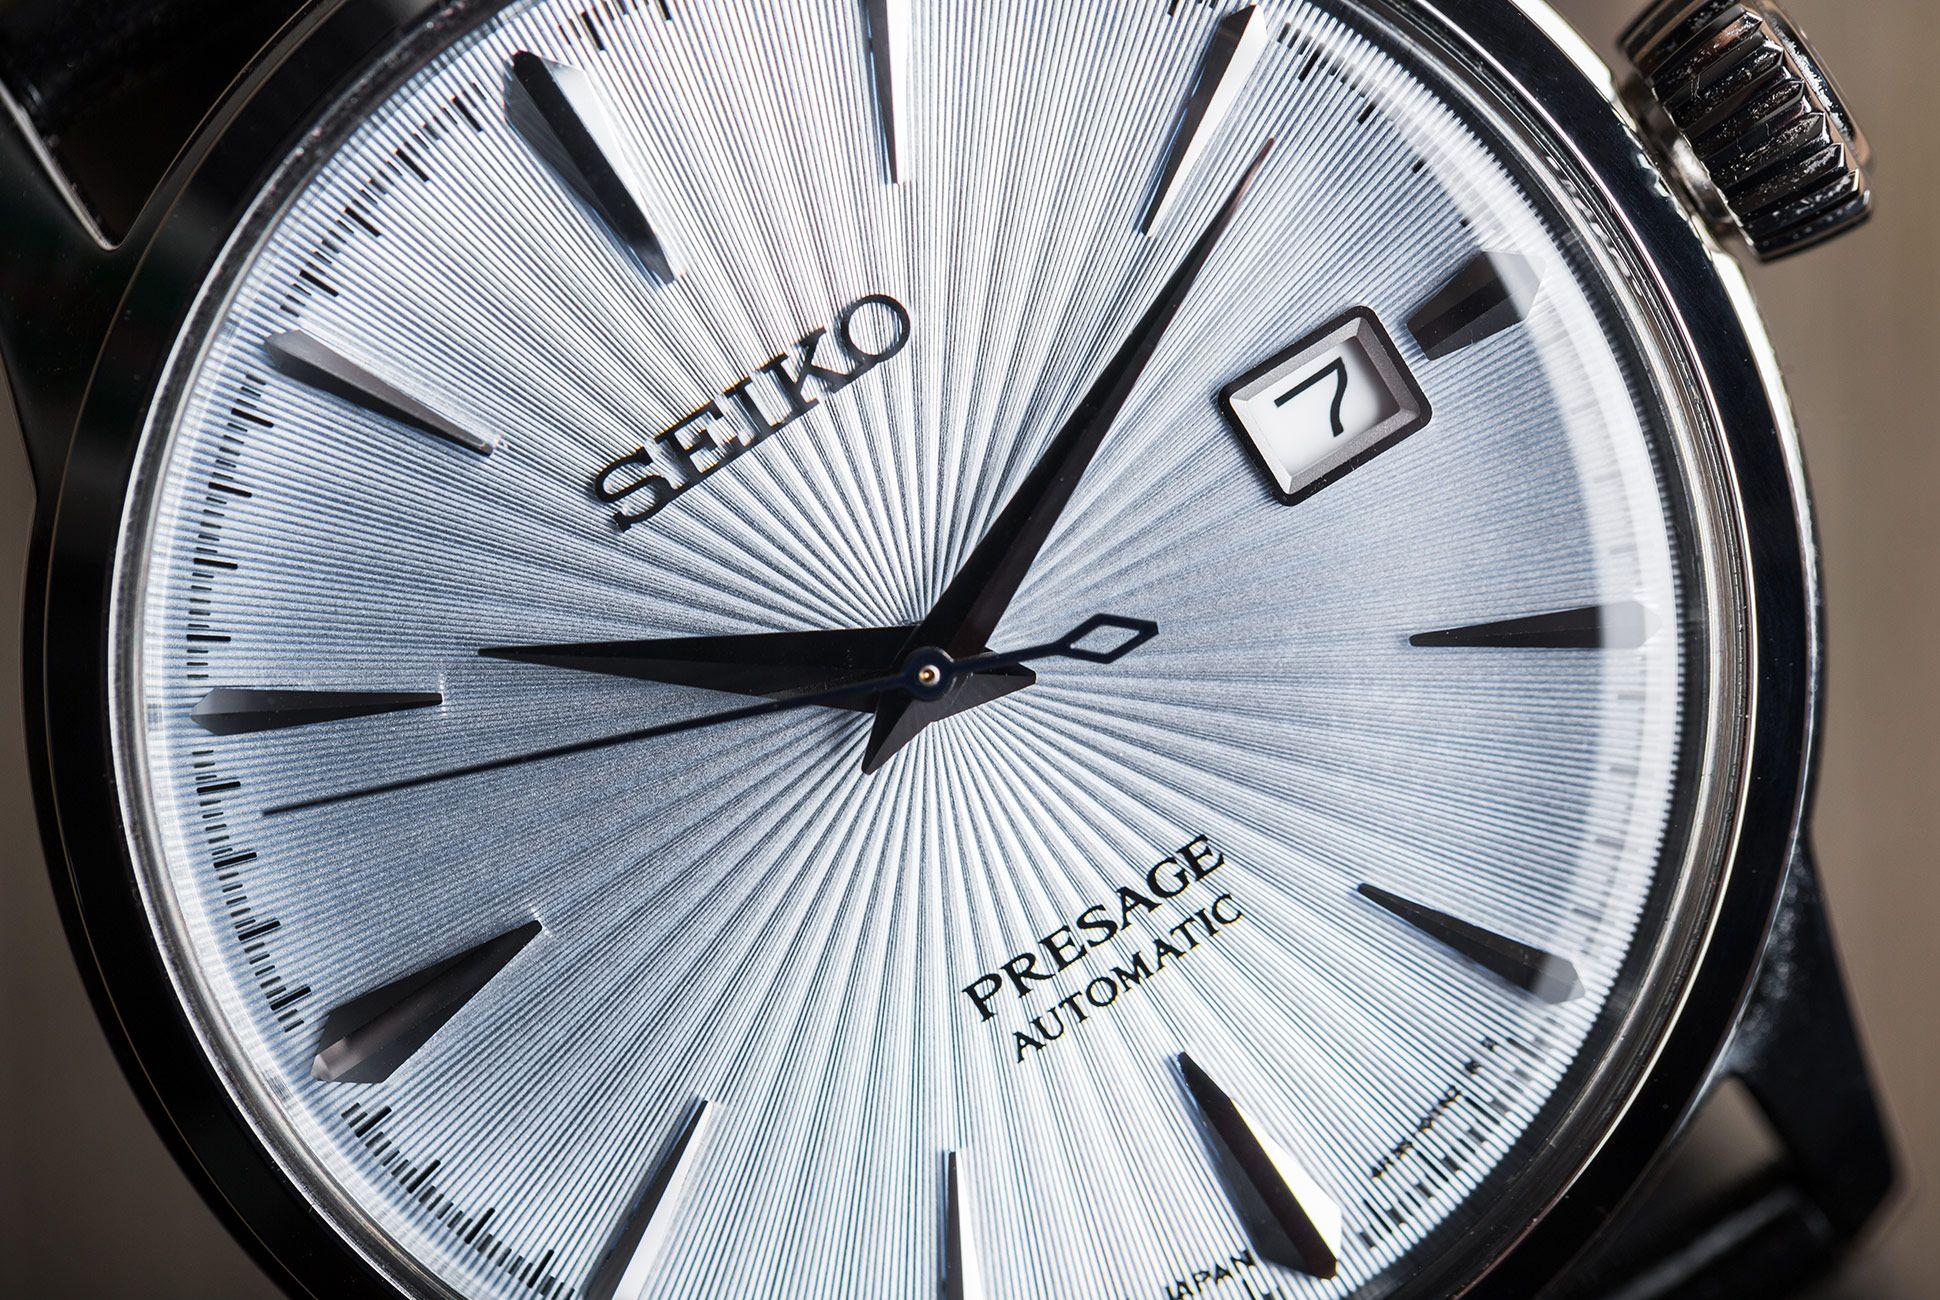 Seiko-Presage-gear-patrol-3